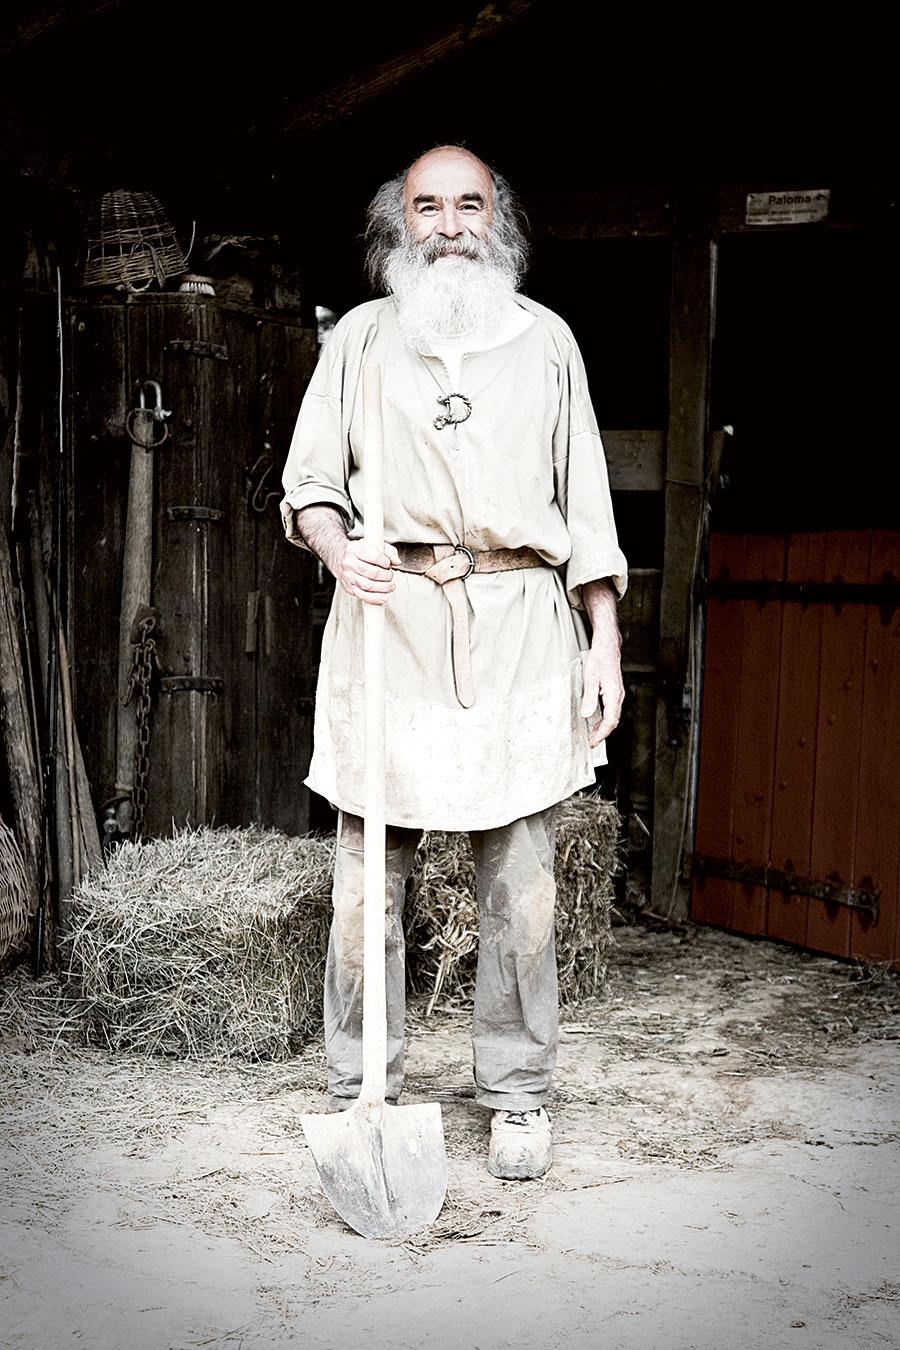 Philippe Delage (59) stonemason at Guedelon